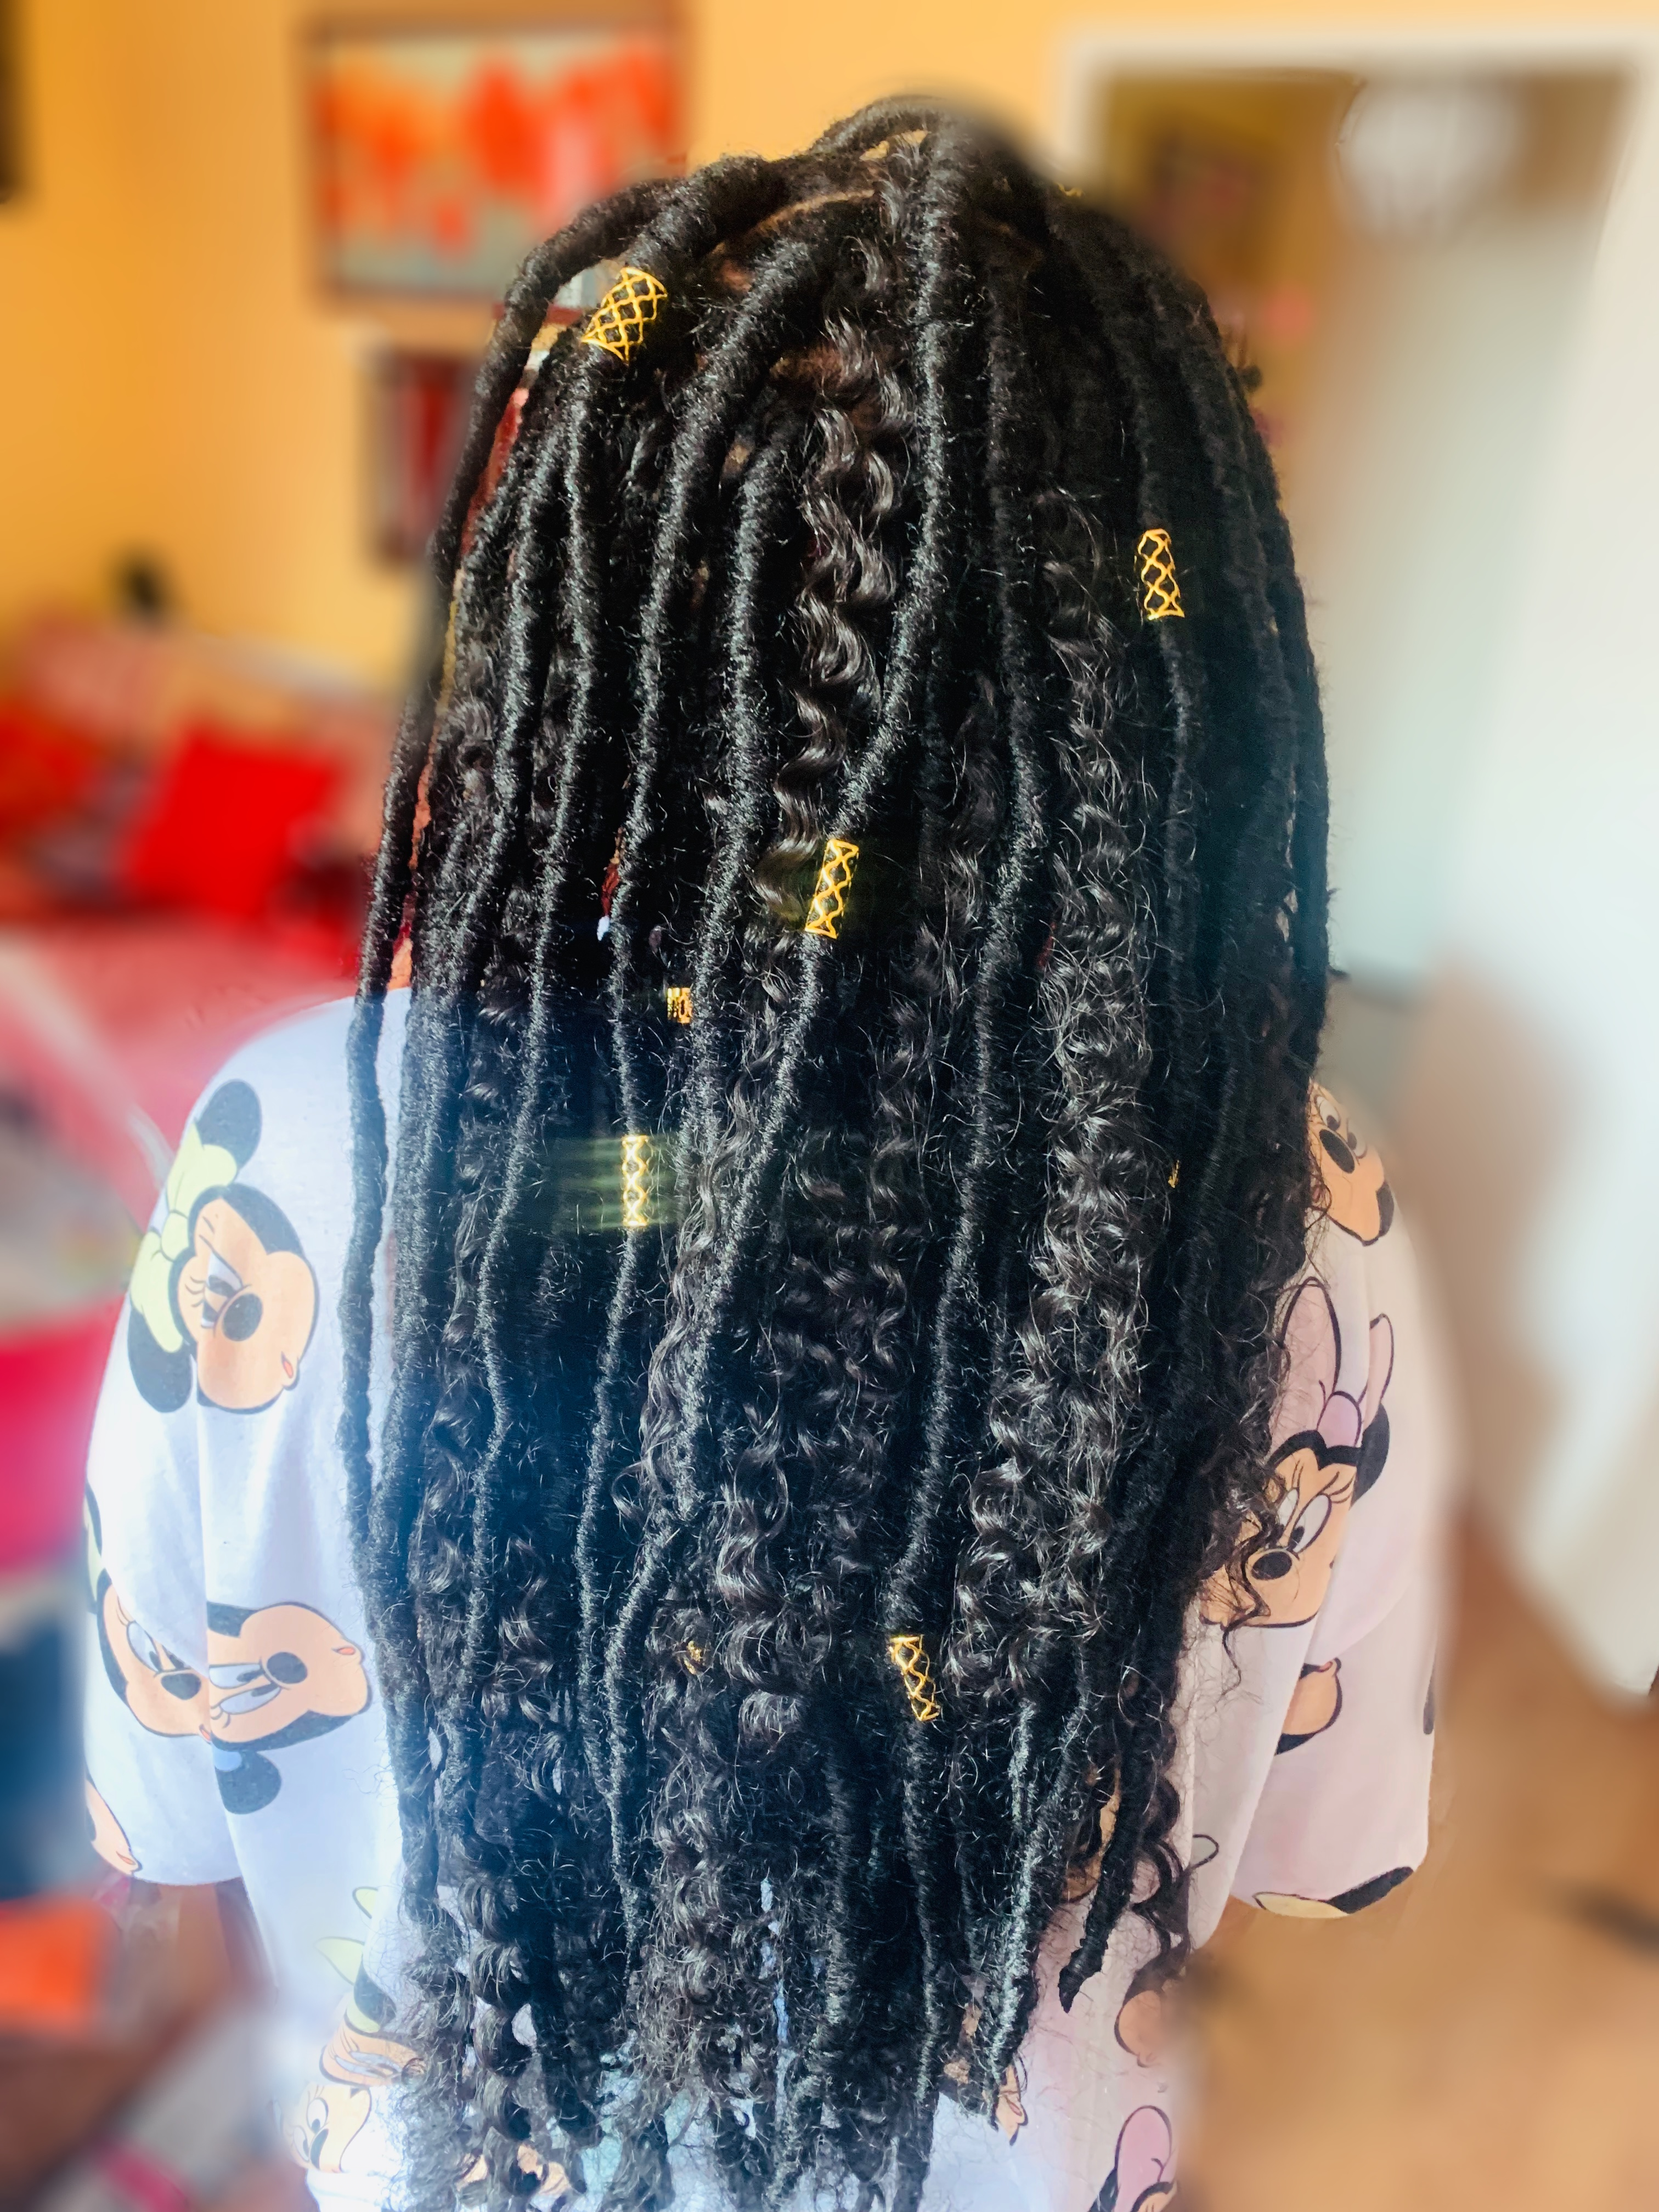 salon de coiffure afro tresse tresses box braids crochet braids vanilles tissages paris 75 77 78 91 92 93 94 95 EBKKFSWW